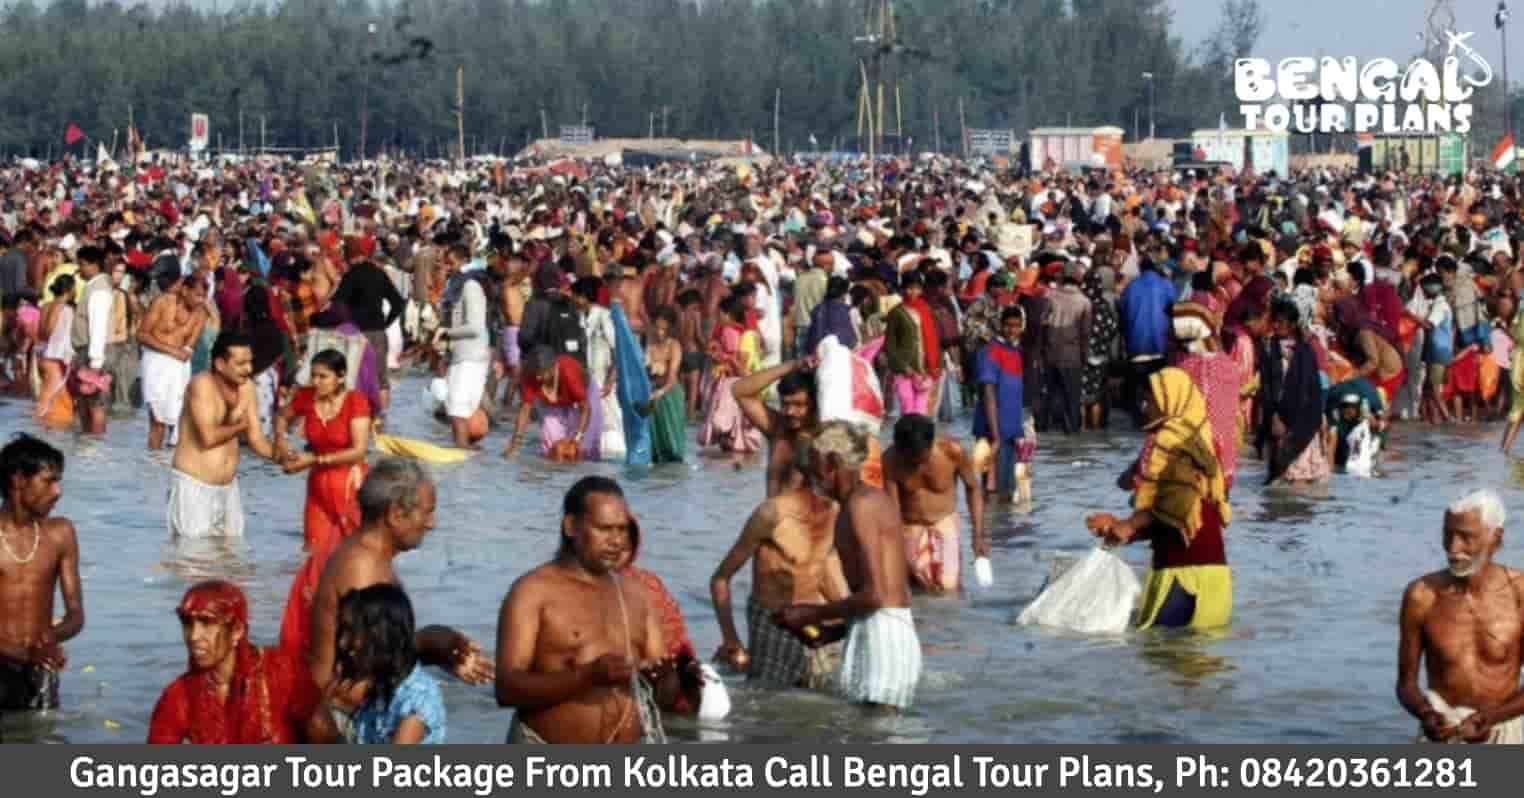 Gangasagar Tour Package From Kolkata